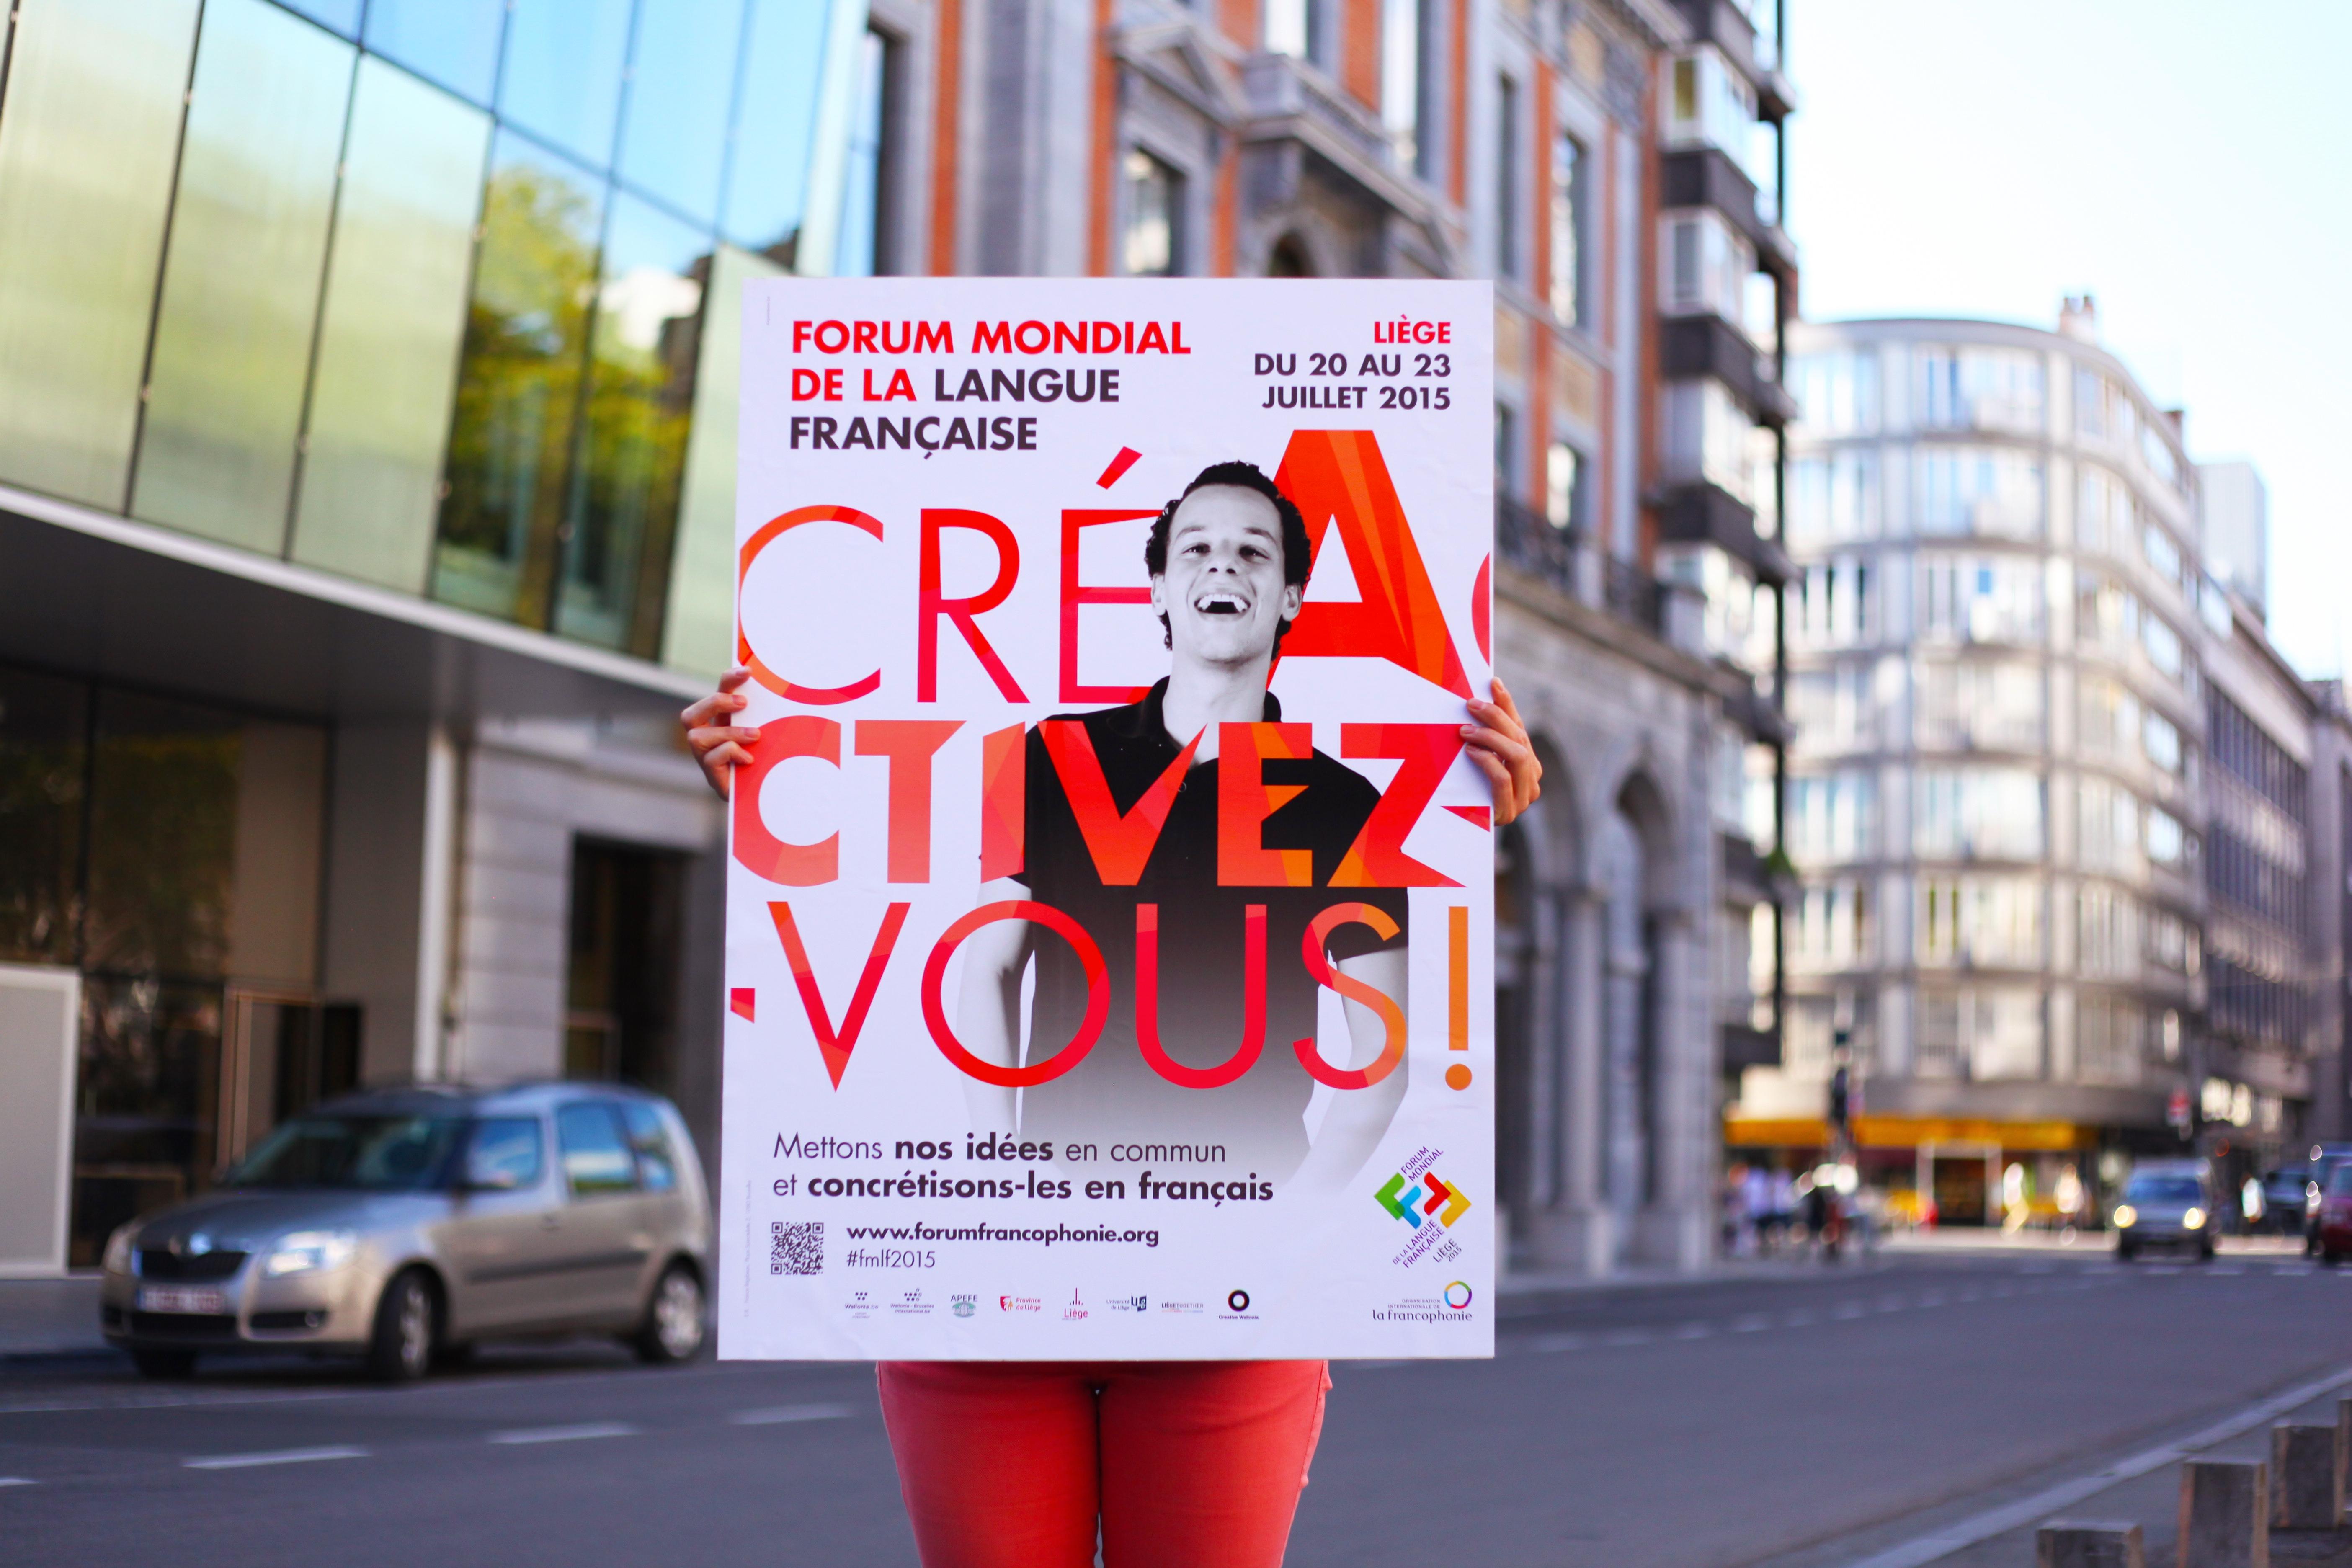 Rencontres en cyber-francophonie #FMLF2015